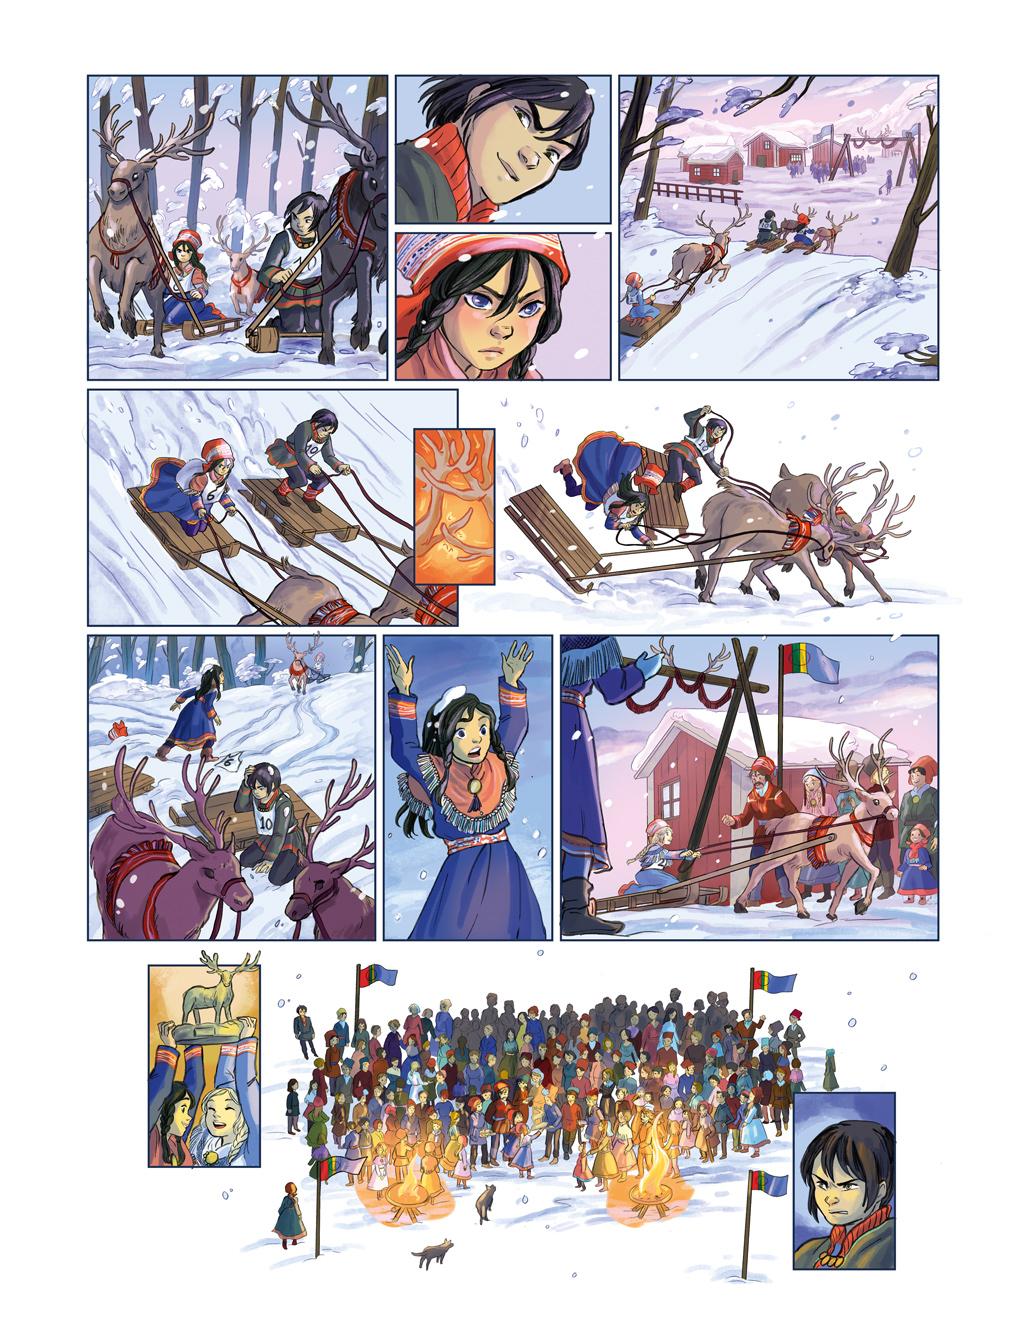 les voyages de lotta page comic reinderr ride boy girl competition sami people